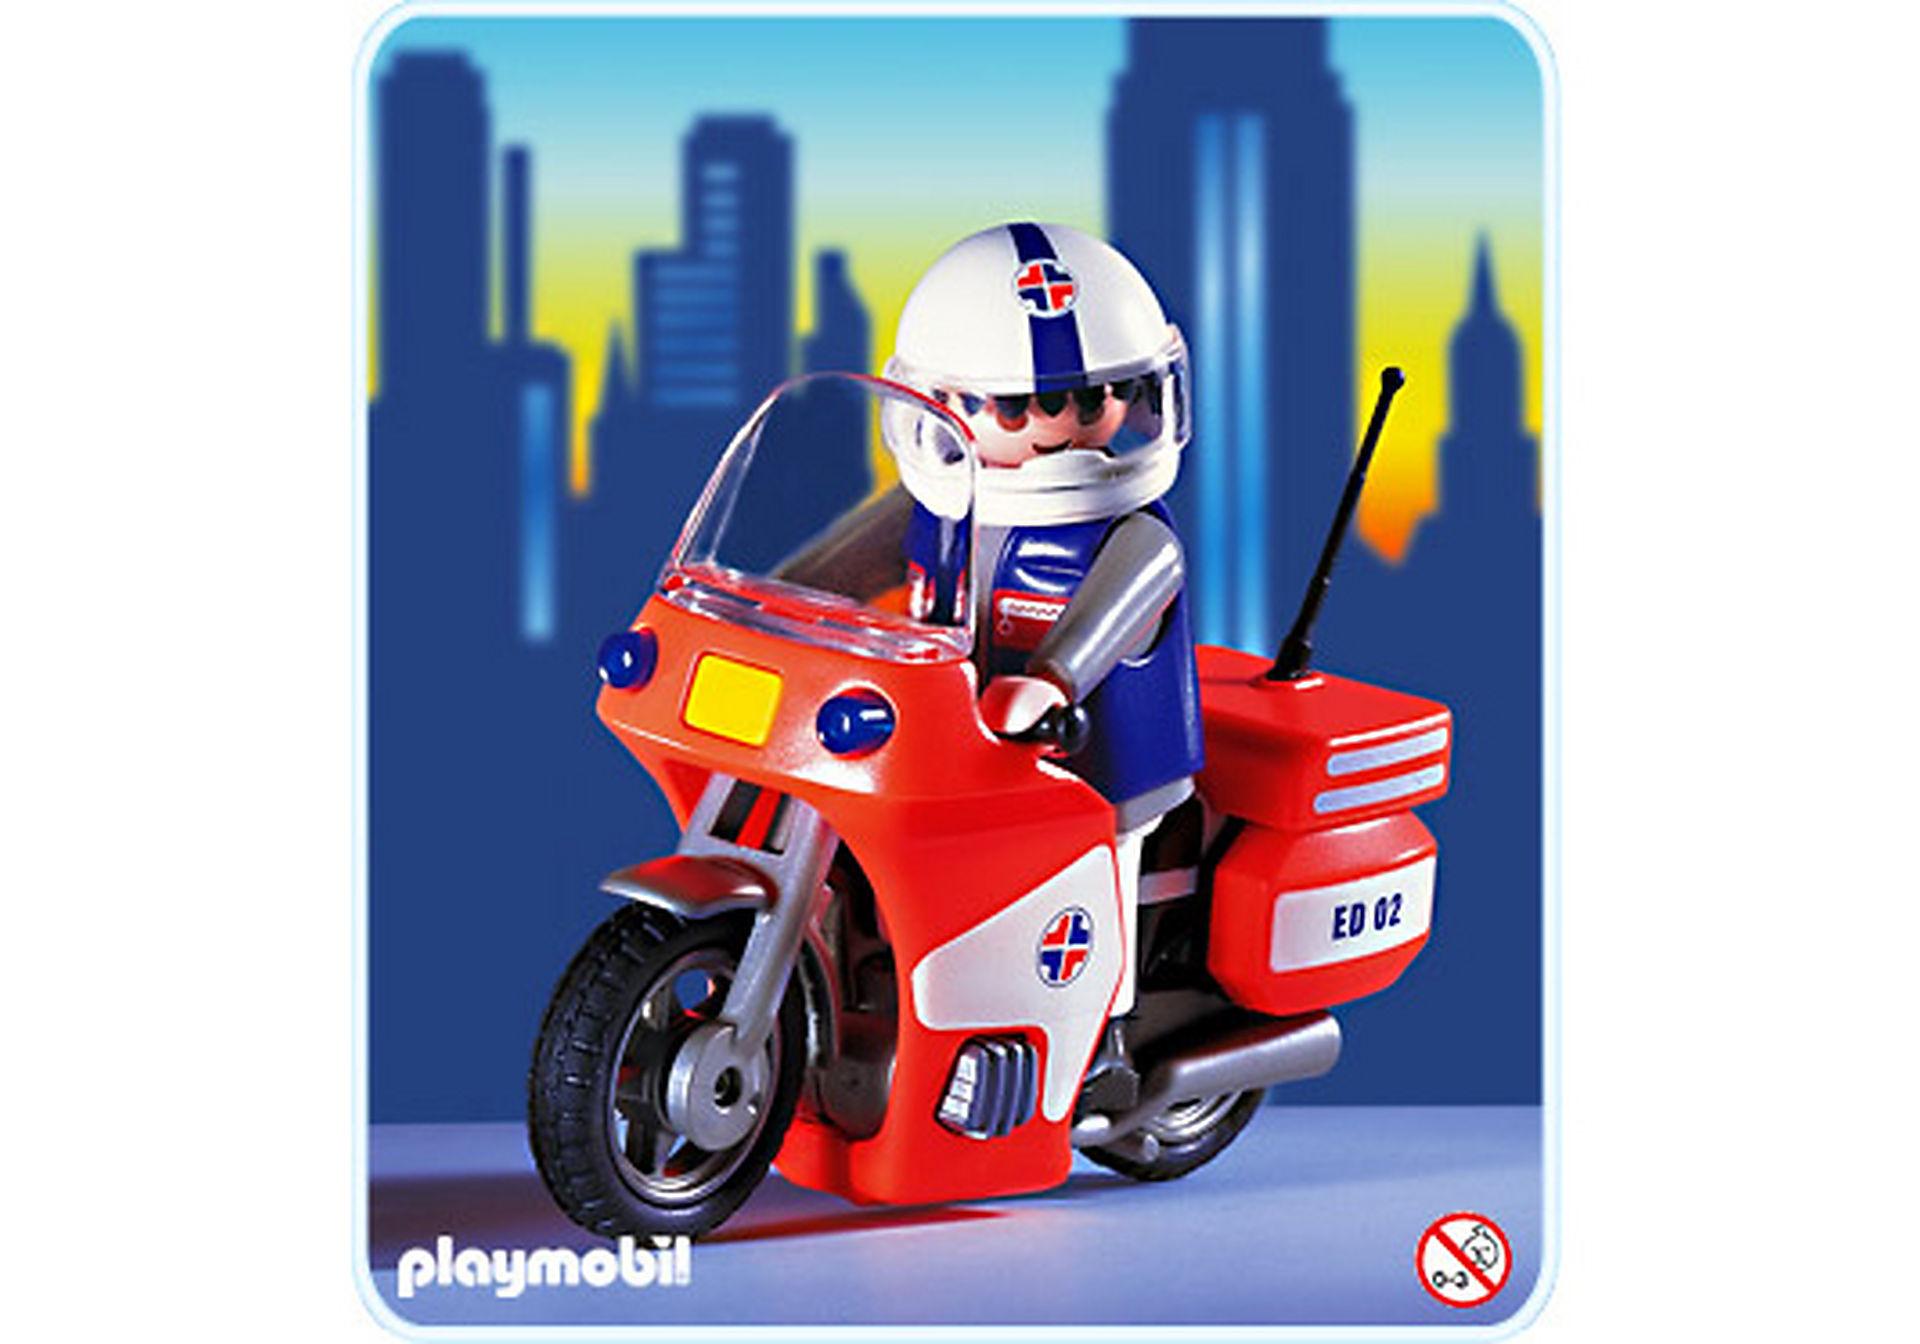 http://media.playmobil.com/i/playmobil/3924-A_product_detail/Notarzt/Motorrad